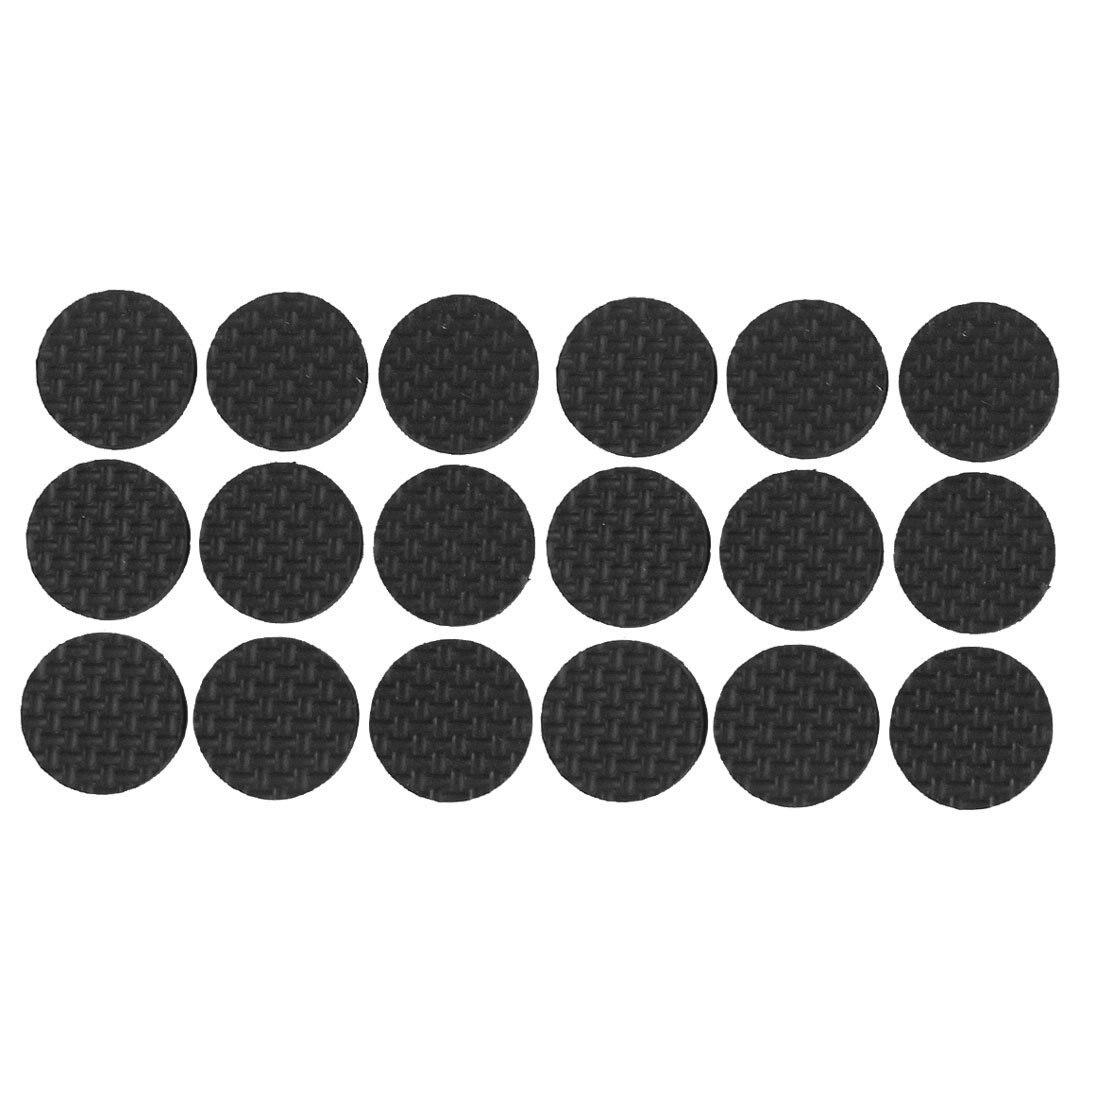 18 Pcs Self Adhesive Black Foam Table Chair Leg Pad Protector18 Pcs Self Adhesive Black Foam Table Chair Leg Pad Protector